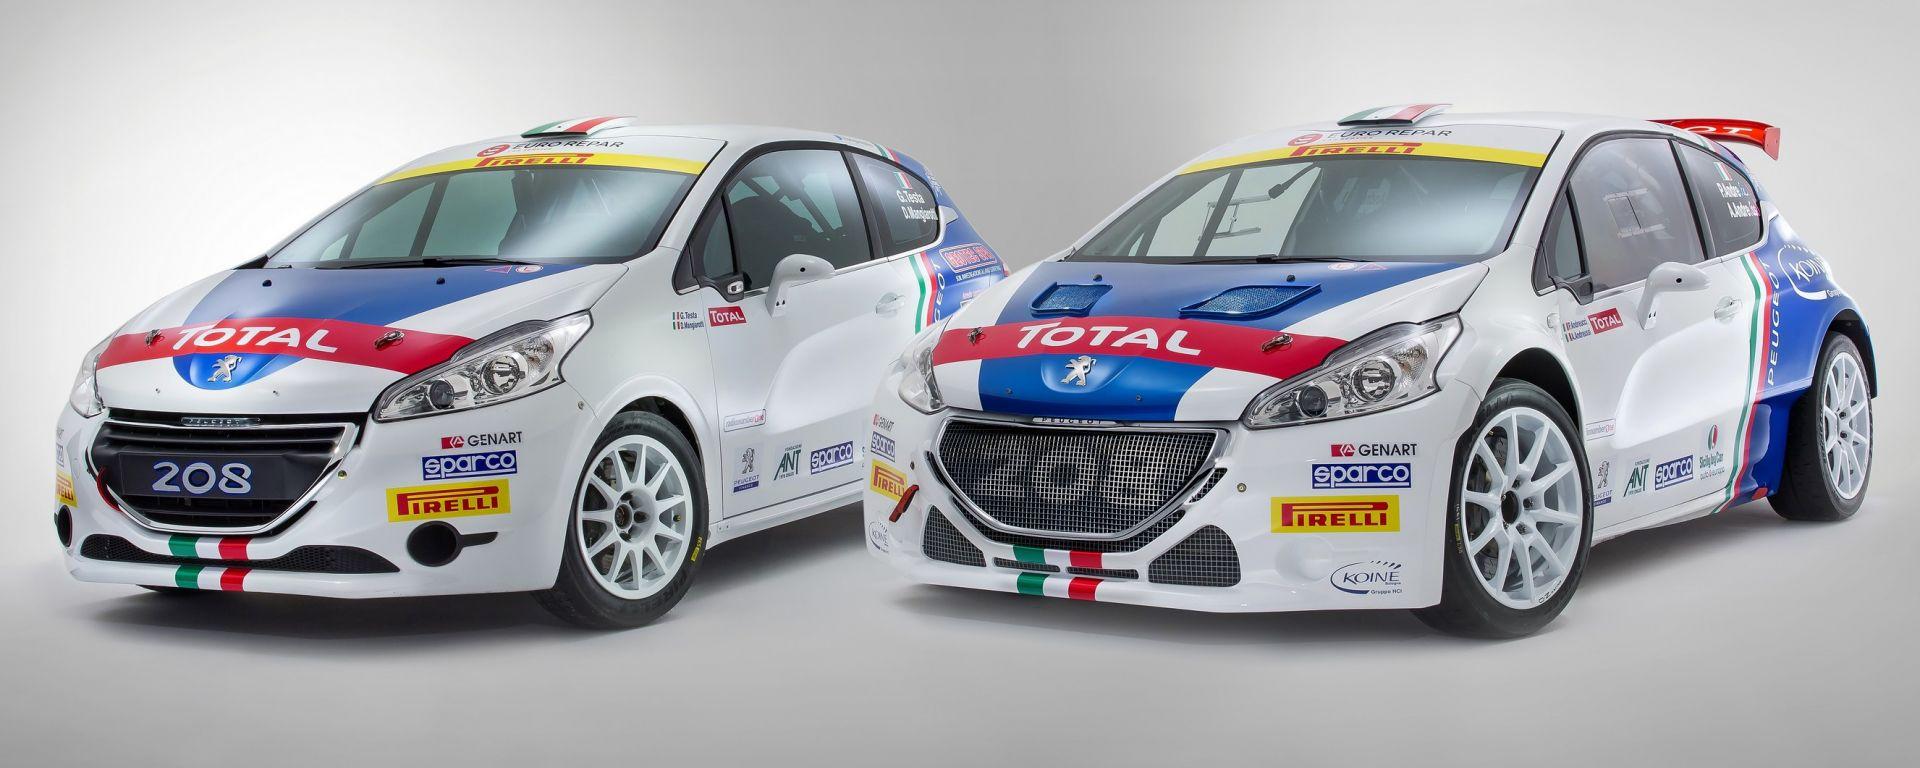 Peugeot Italia: i programmi sportivi 2016